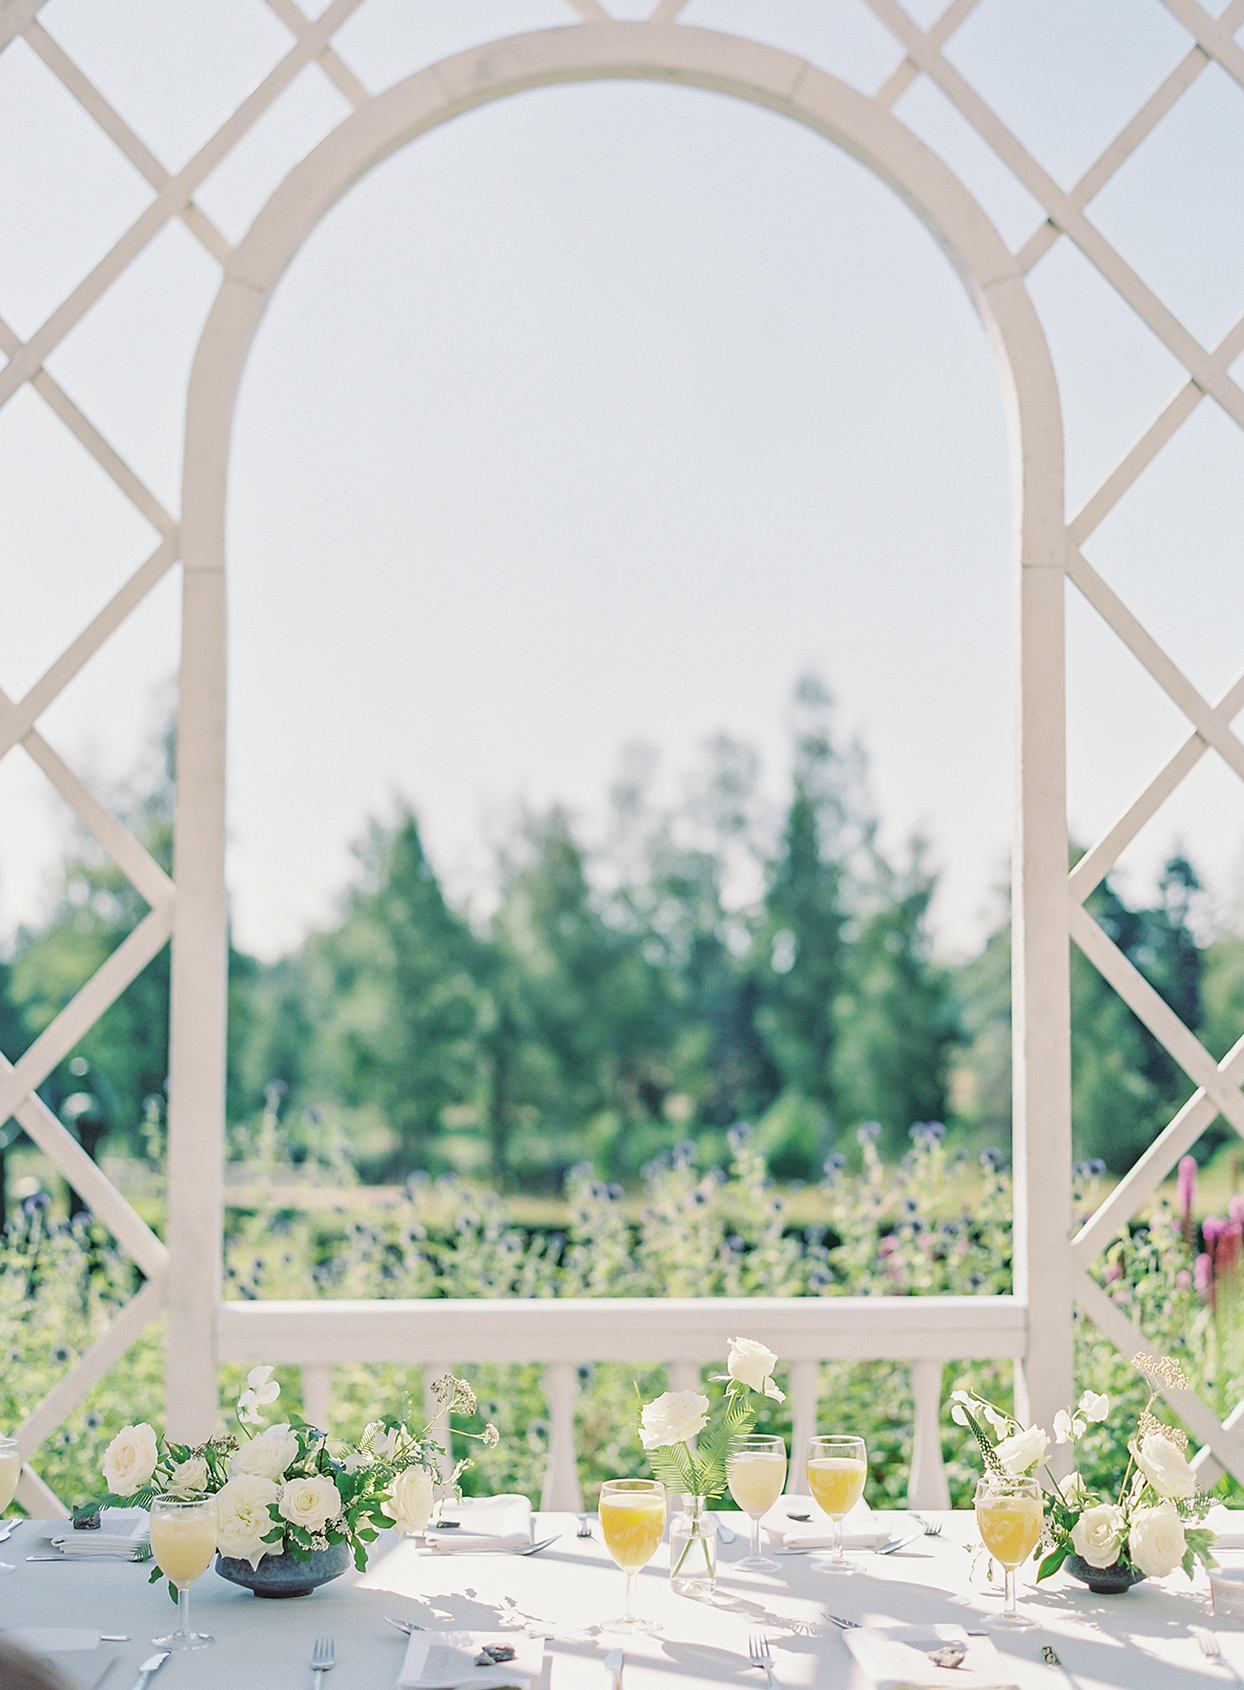 laura alexander wedding brunch table with white trellis